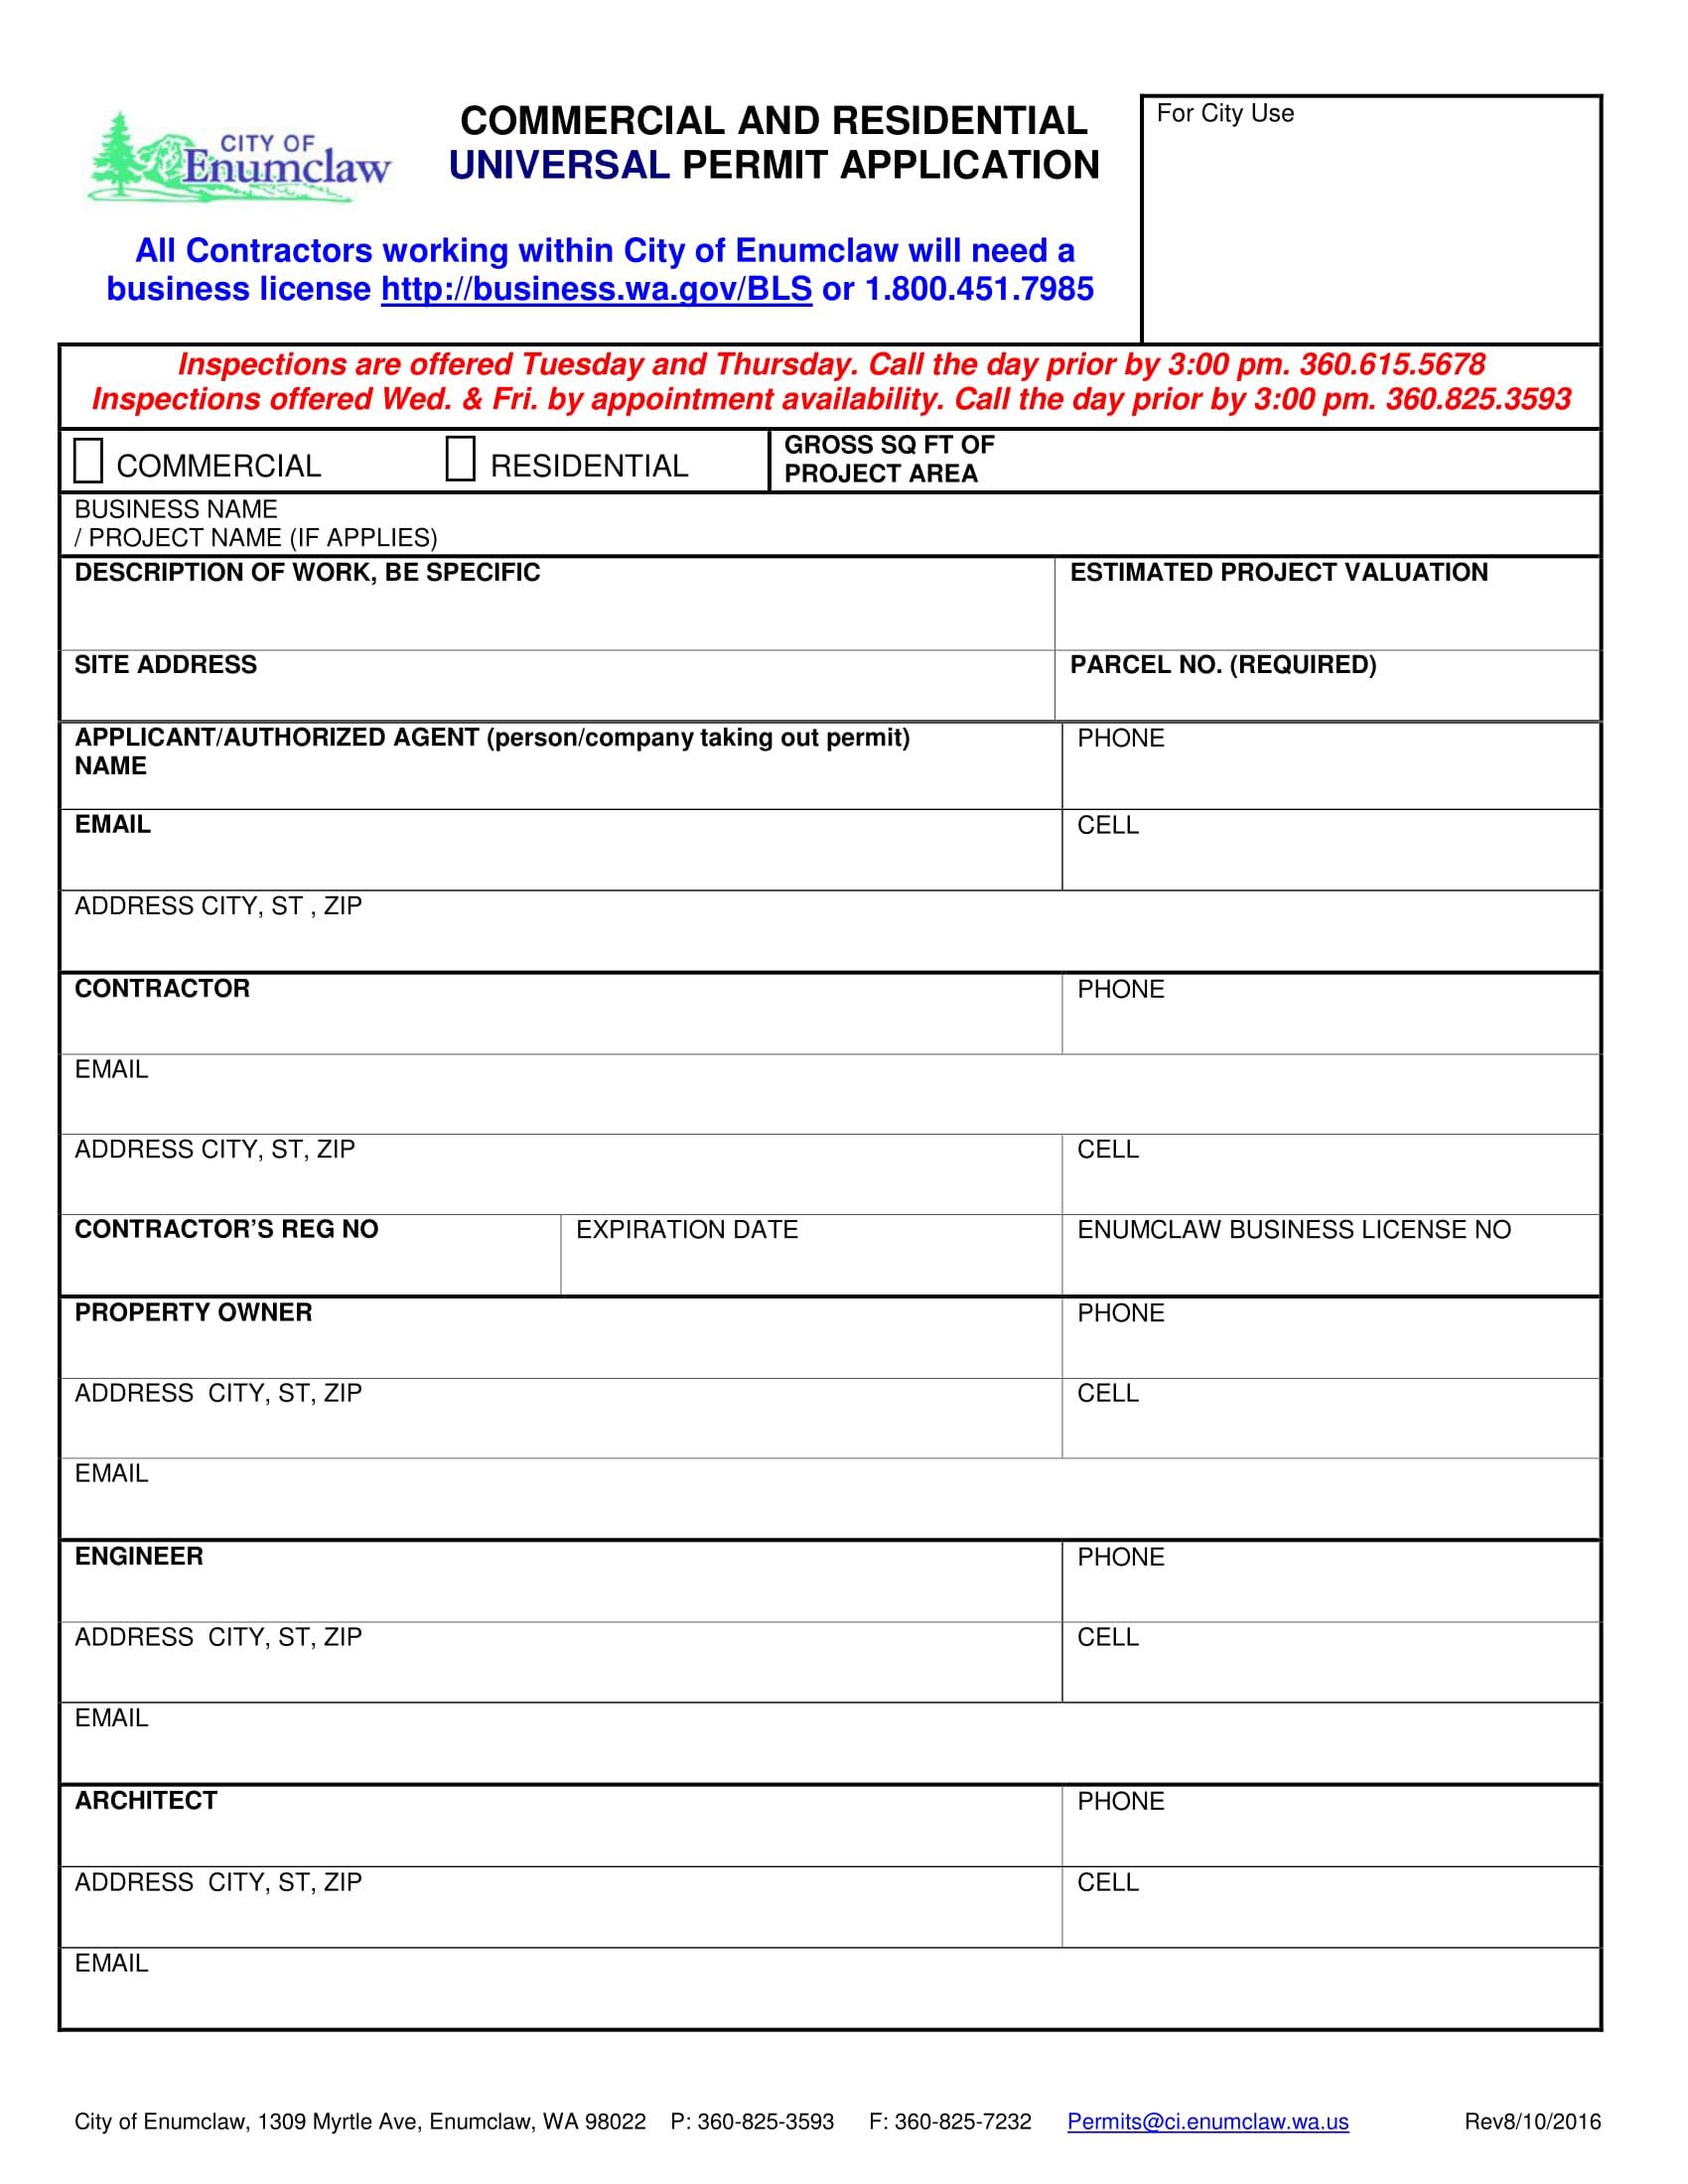 universal building permit app 2016 08 10 fillable